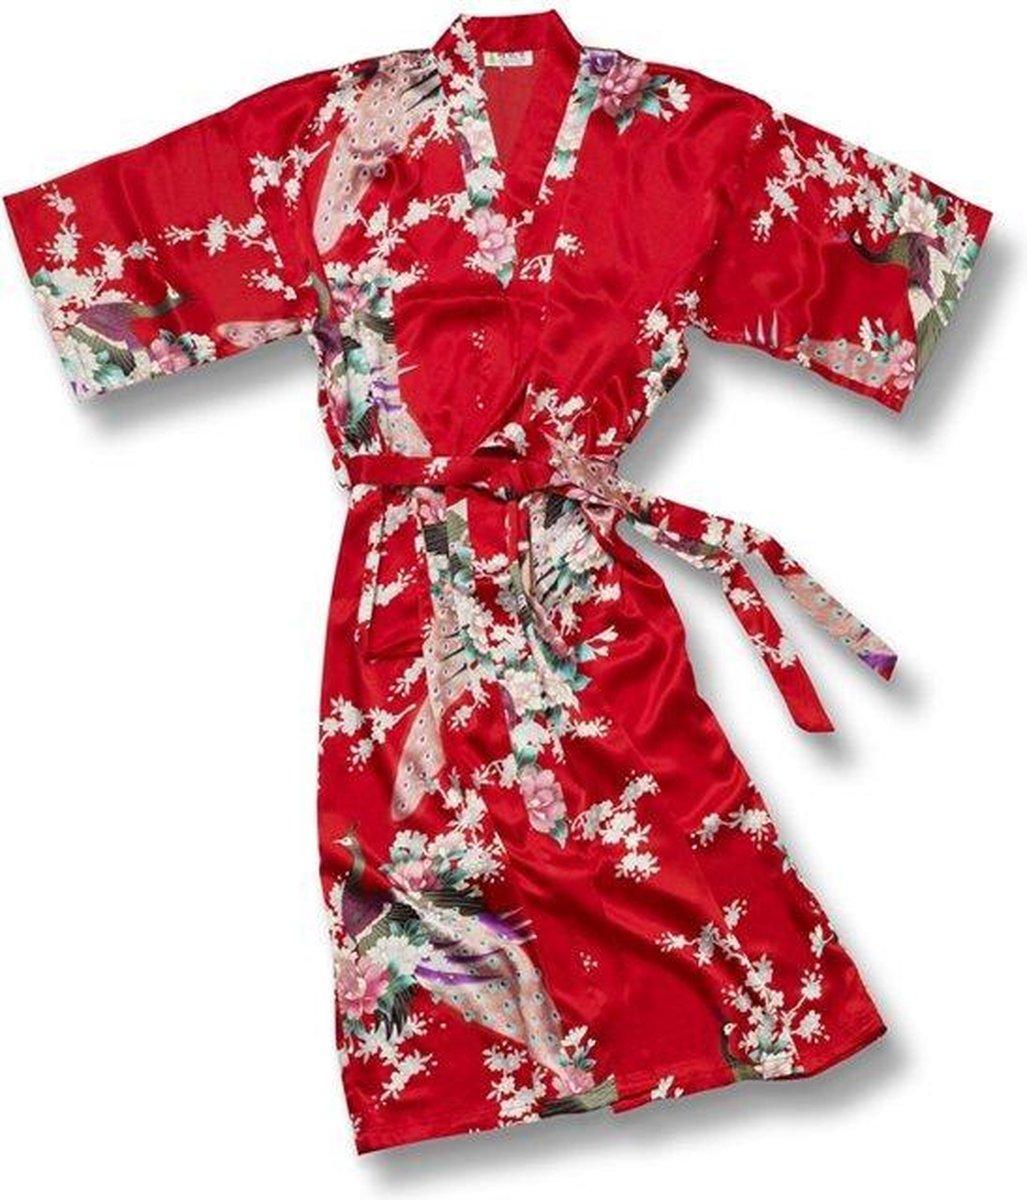 TA-HWA Kimono met Pauw Motief Rood Dames Kimono L